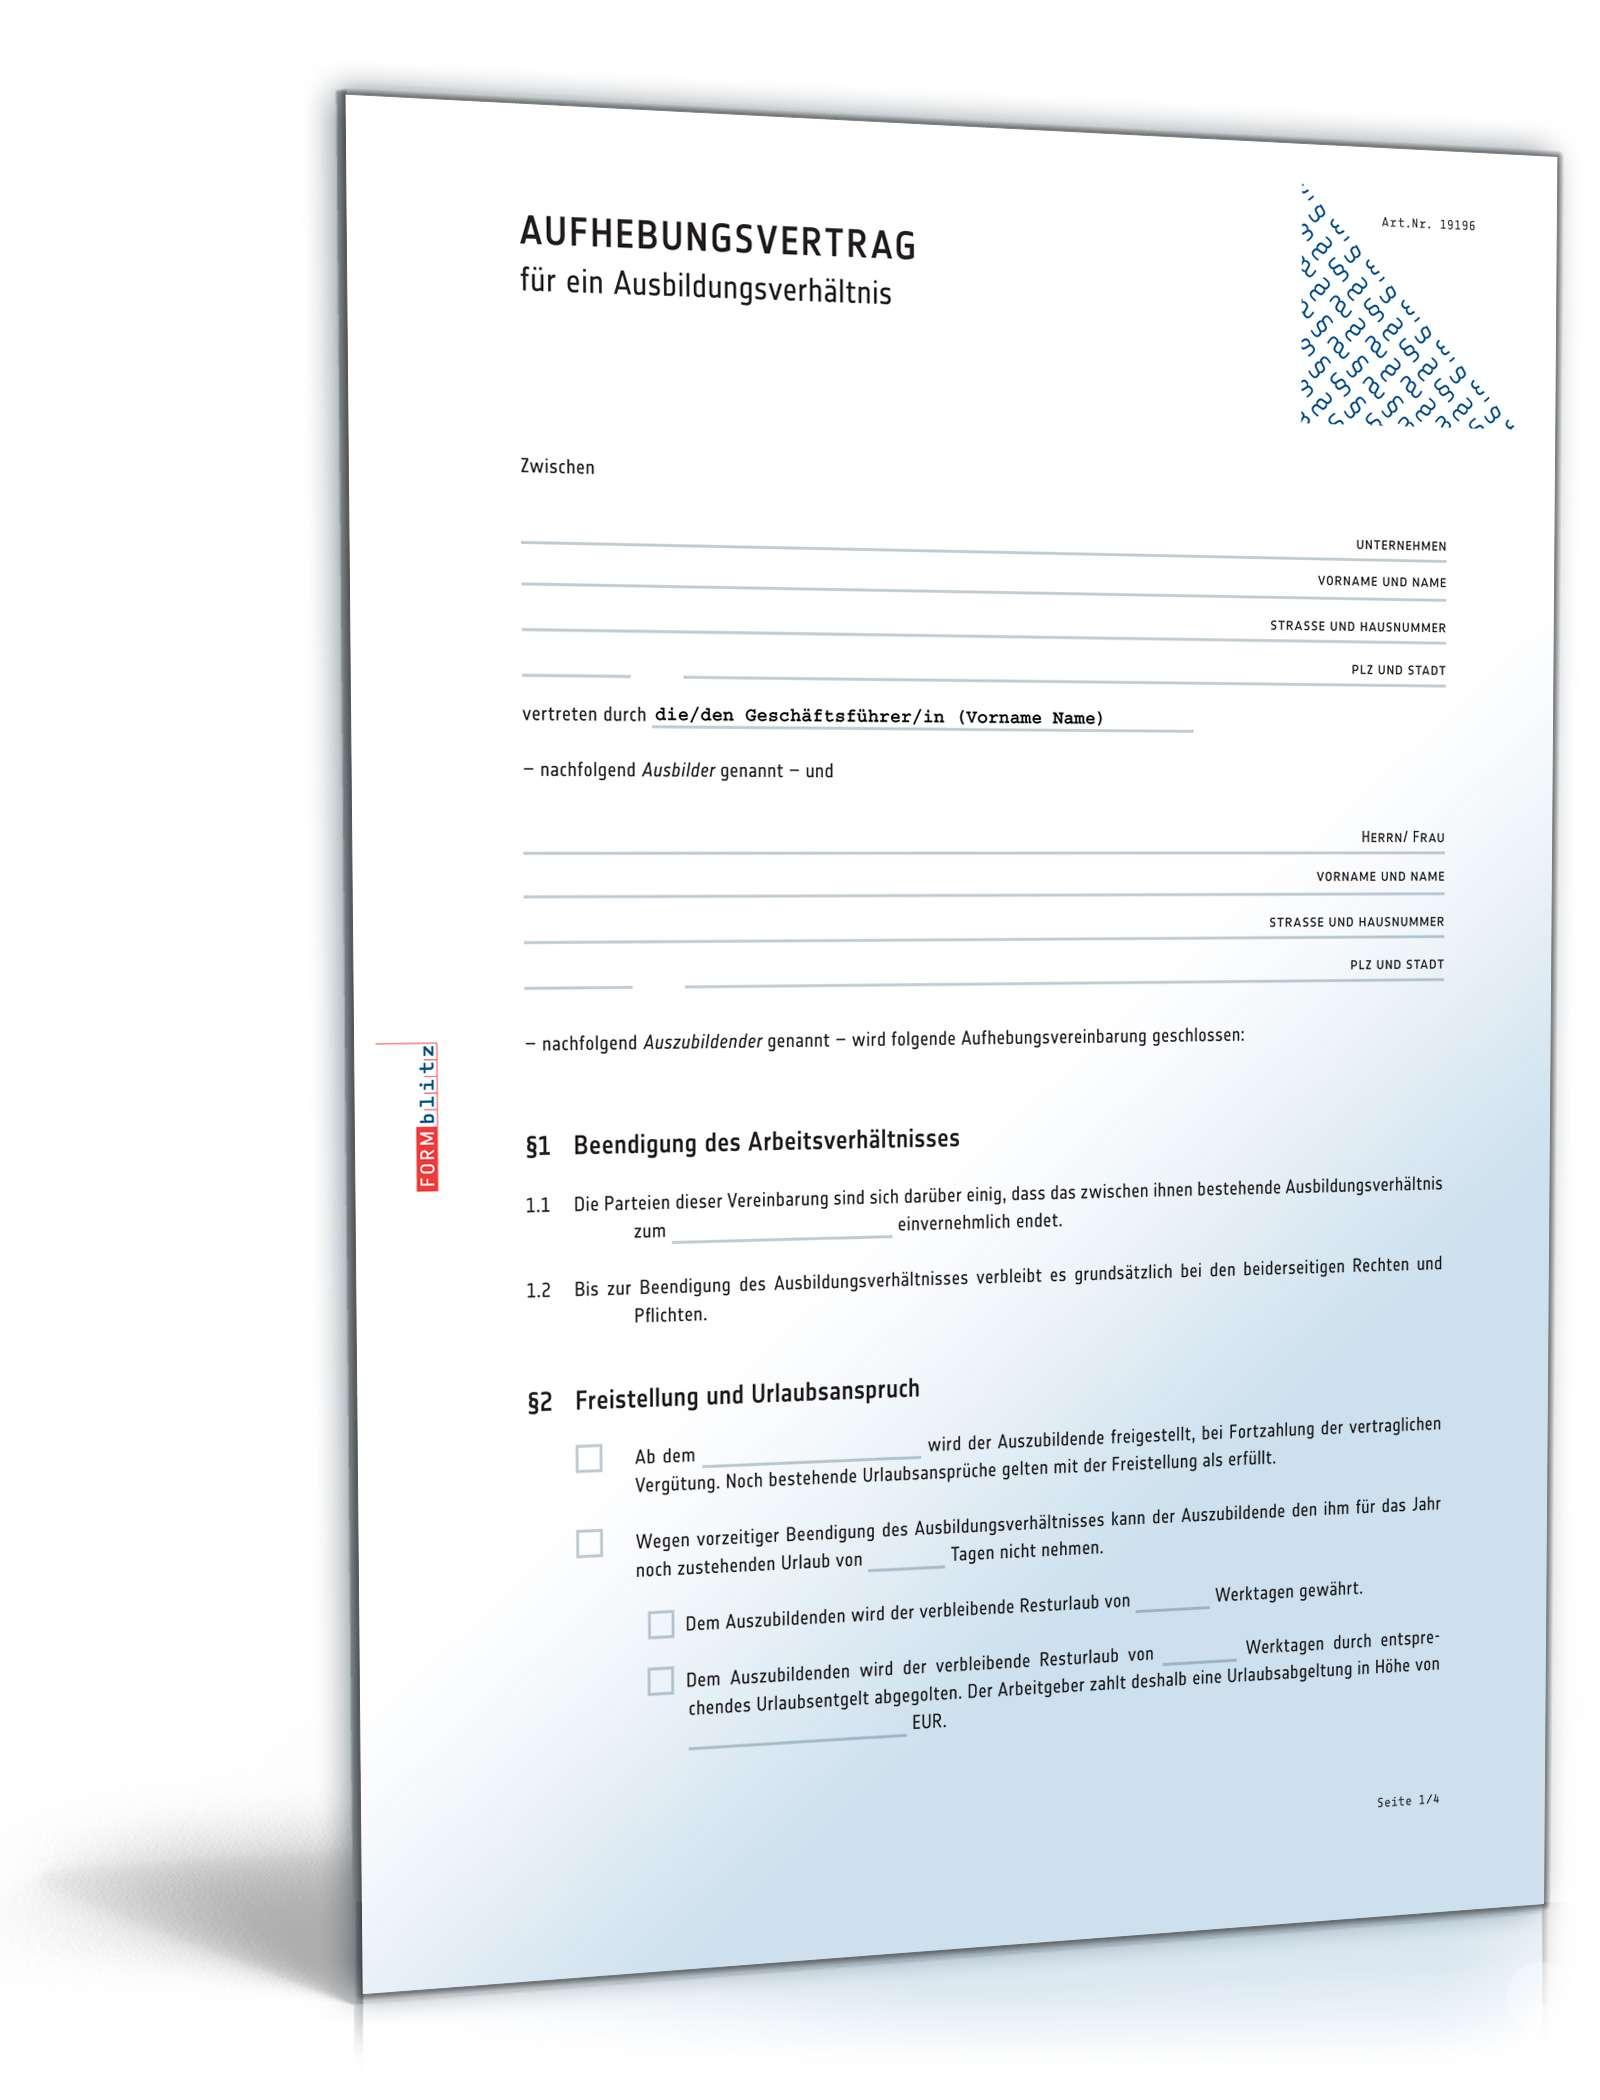 Aufhebungsvertrag Ausbildungsverhältnis | Muster zum Download